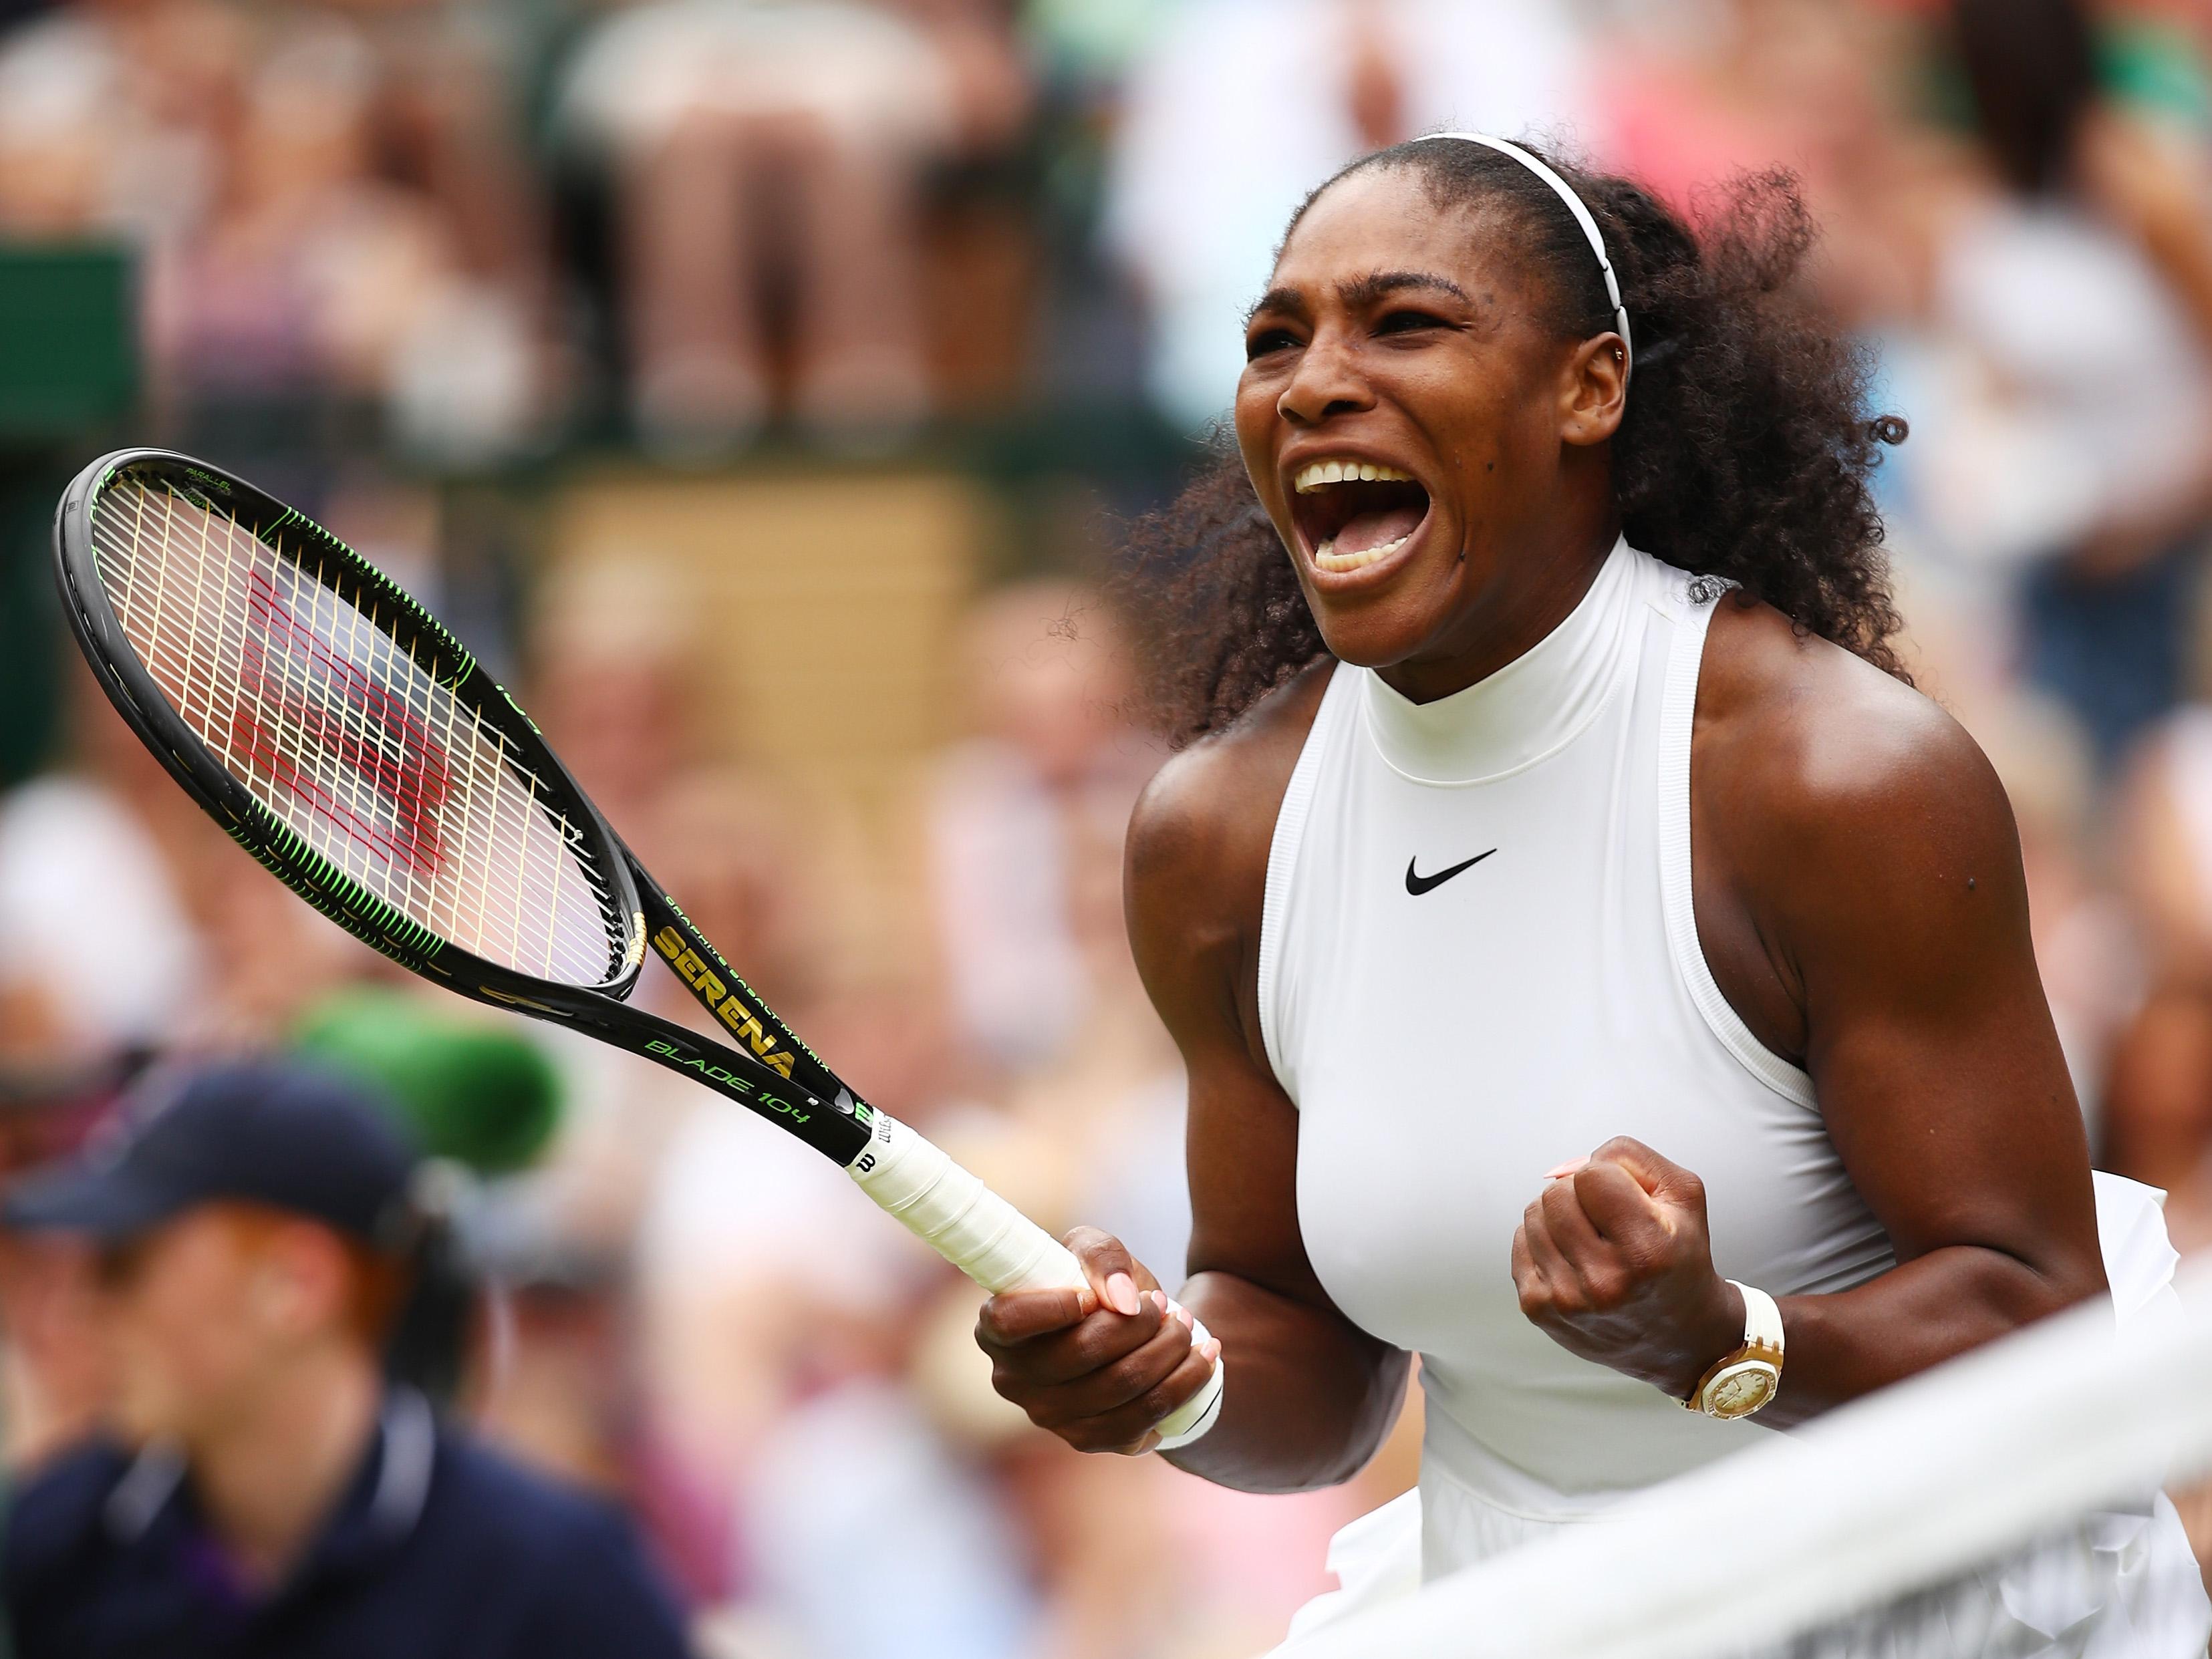 Day Twelve: The Championships – Wimbledon 2016